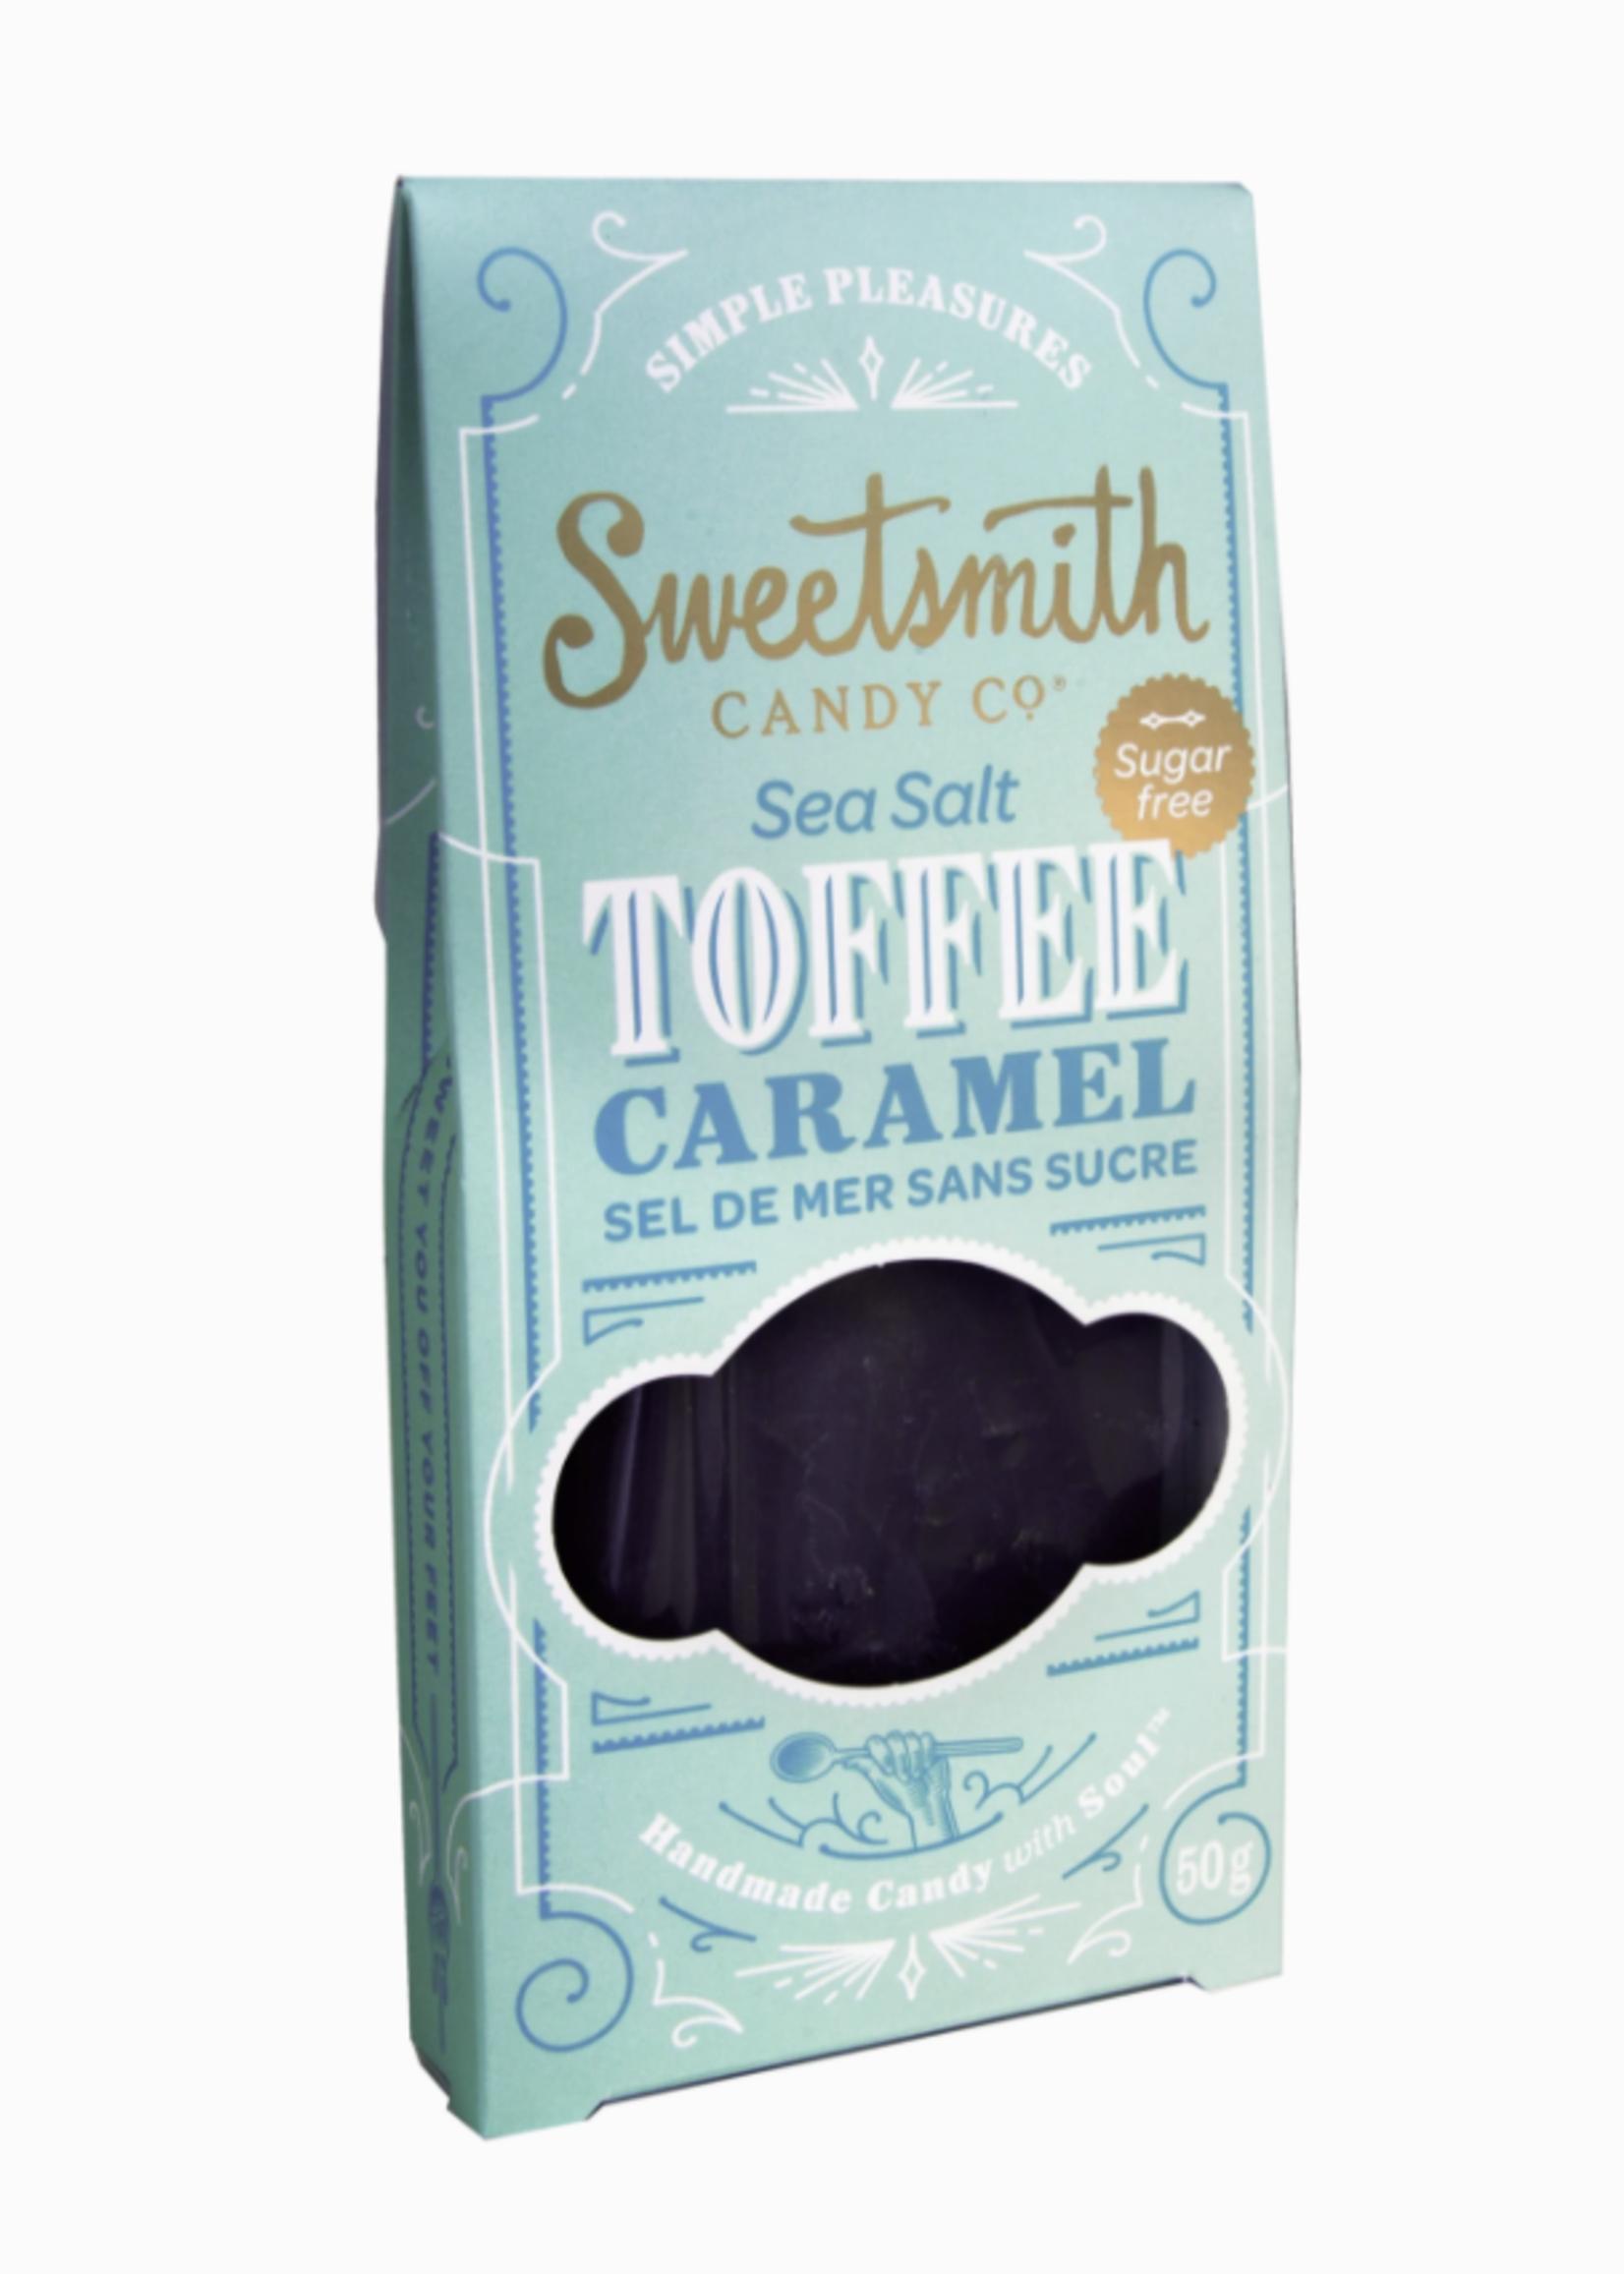 Sweetsmith Candy Co. Sea Salt Chocolate Toffee | SUGAR FREE